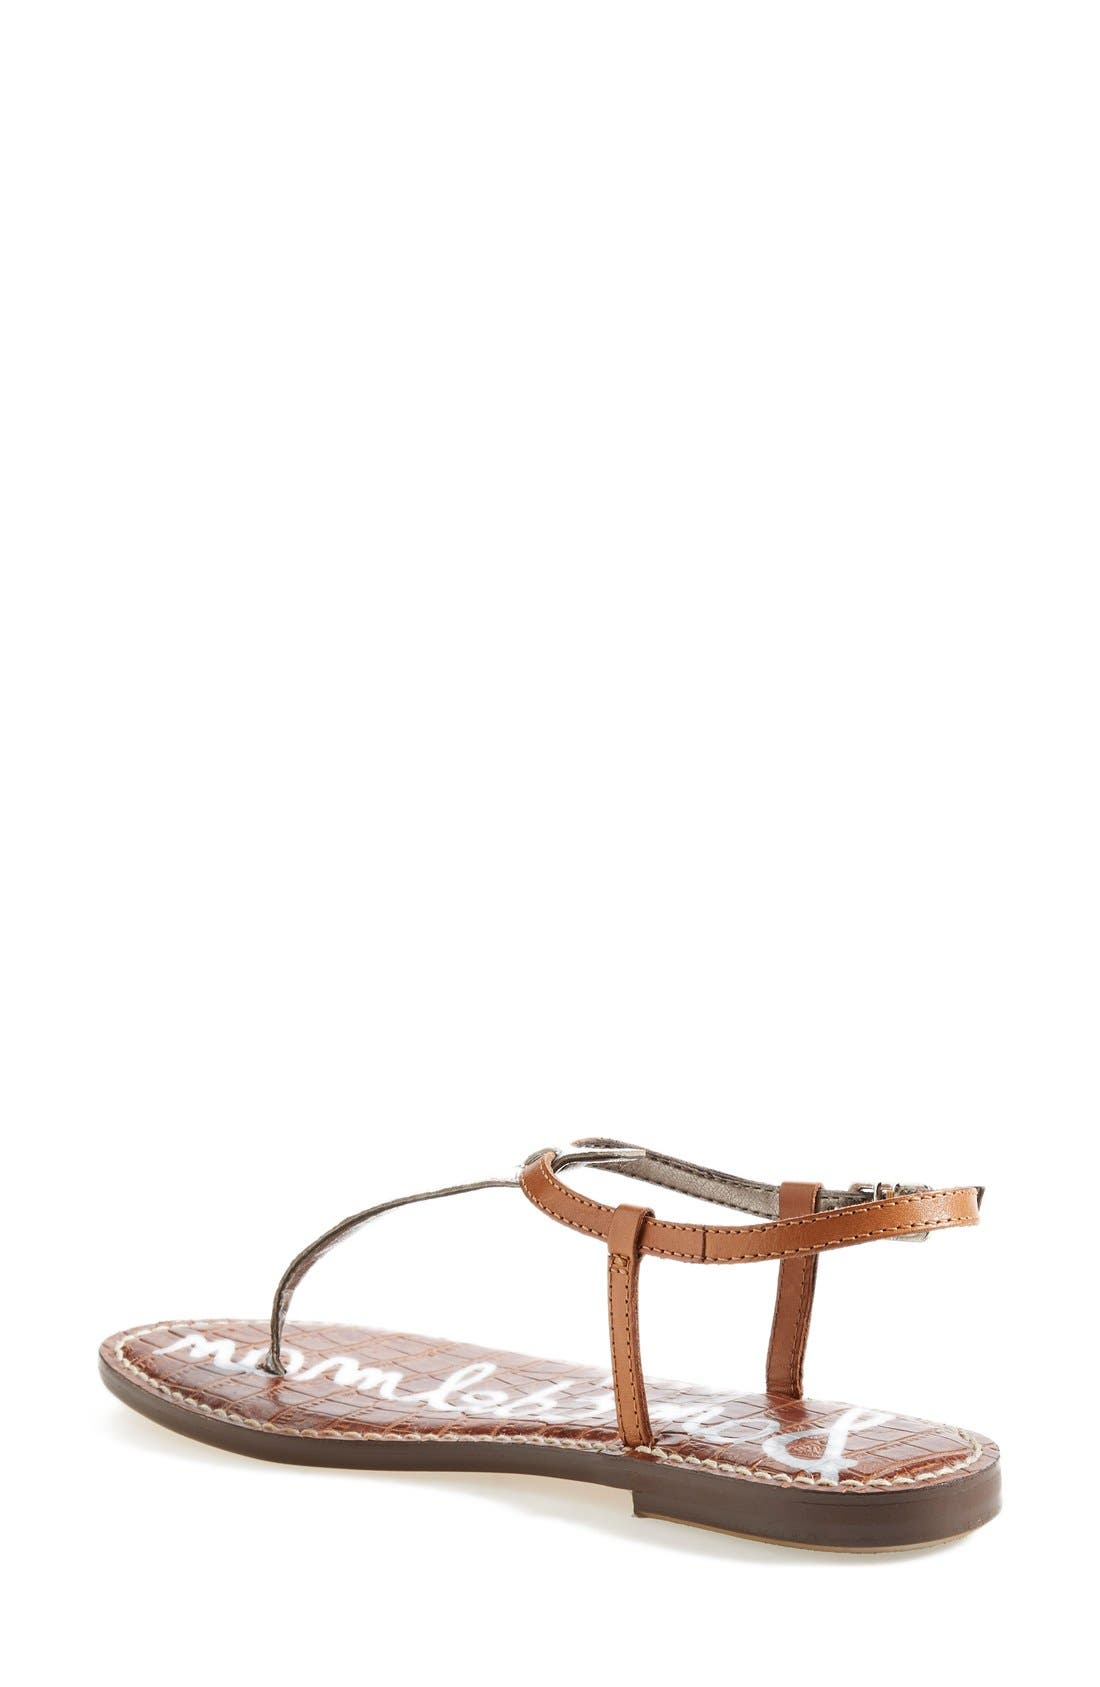 Alternate Image 2  - Sam Edelman 'Gigi' Leather Sandal (Women)